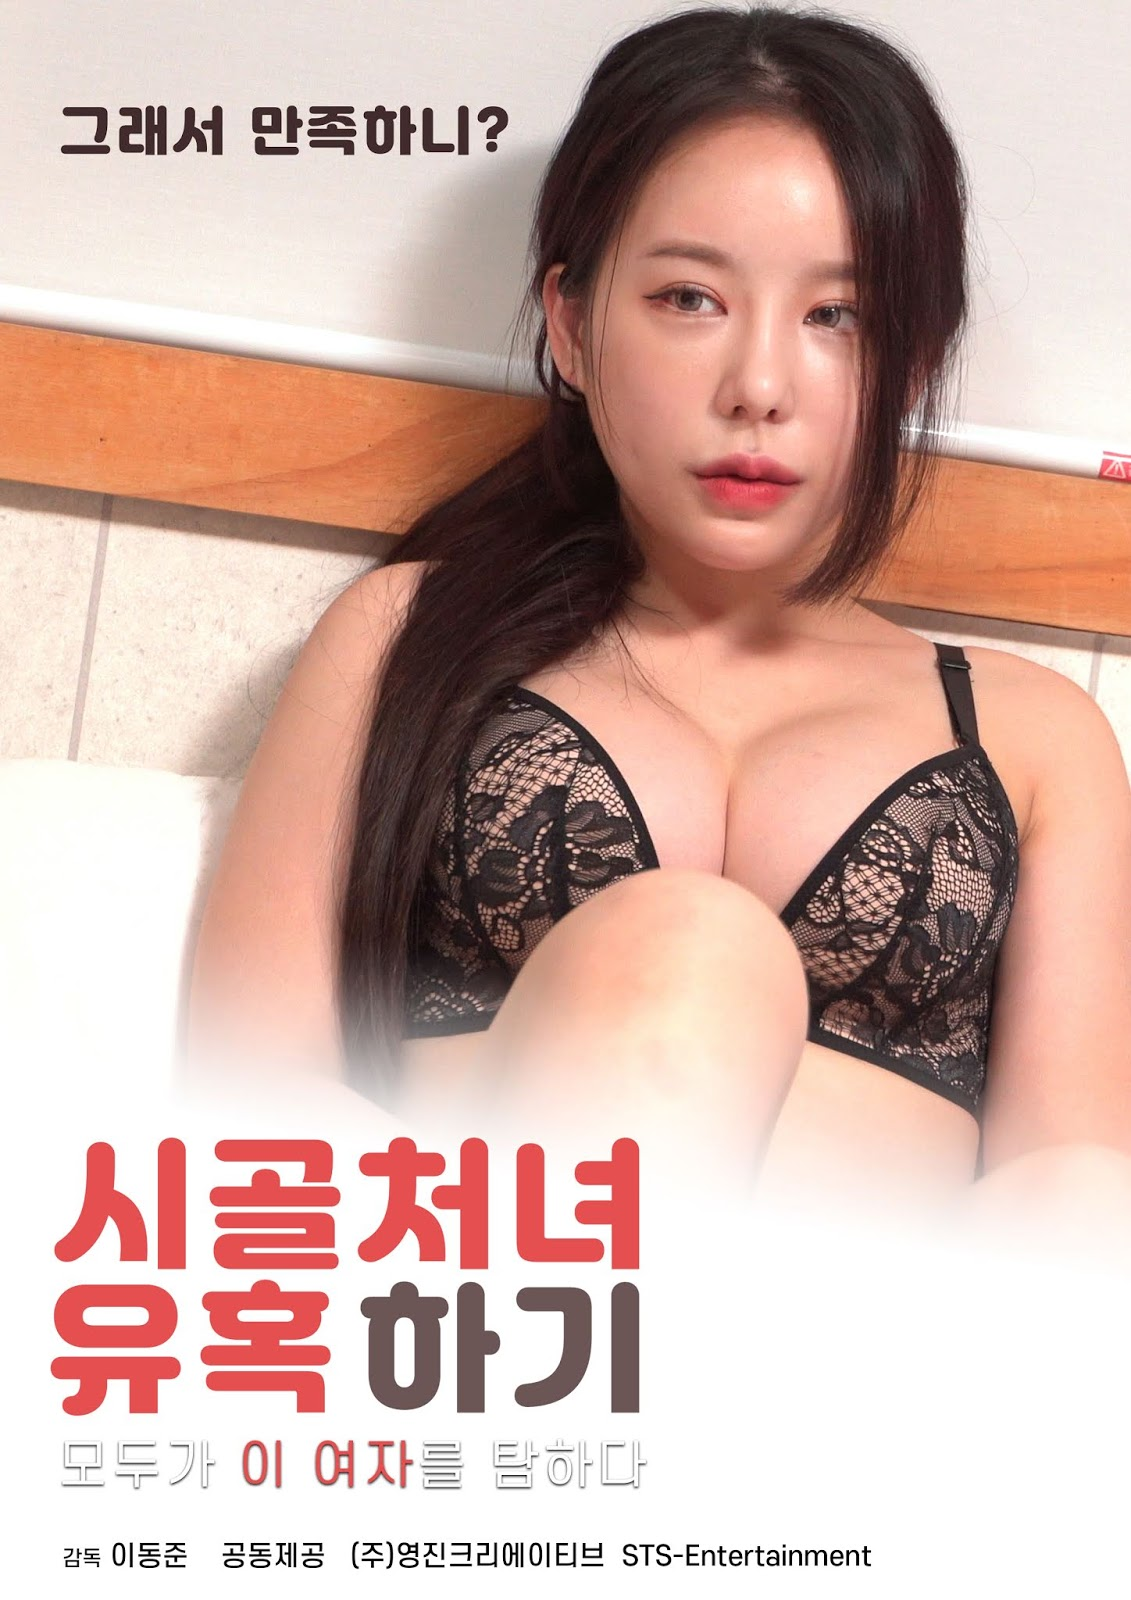 Seducing the Country Girl Full Korea 18+ Adult Movie Online Free